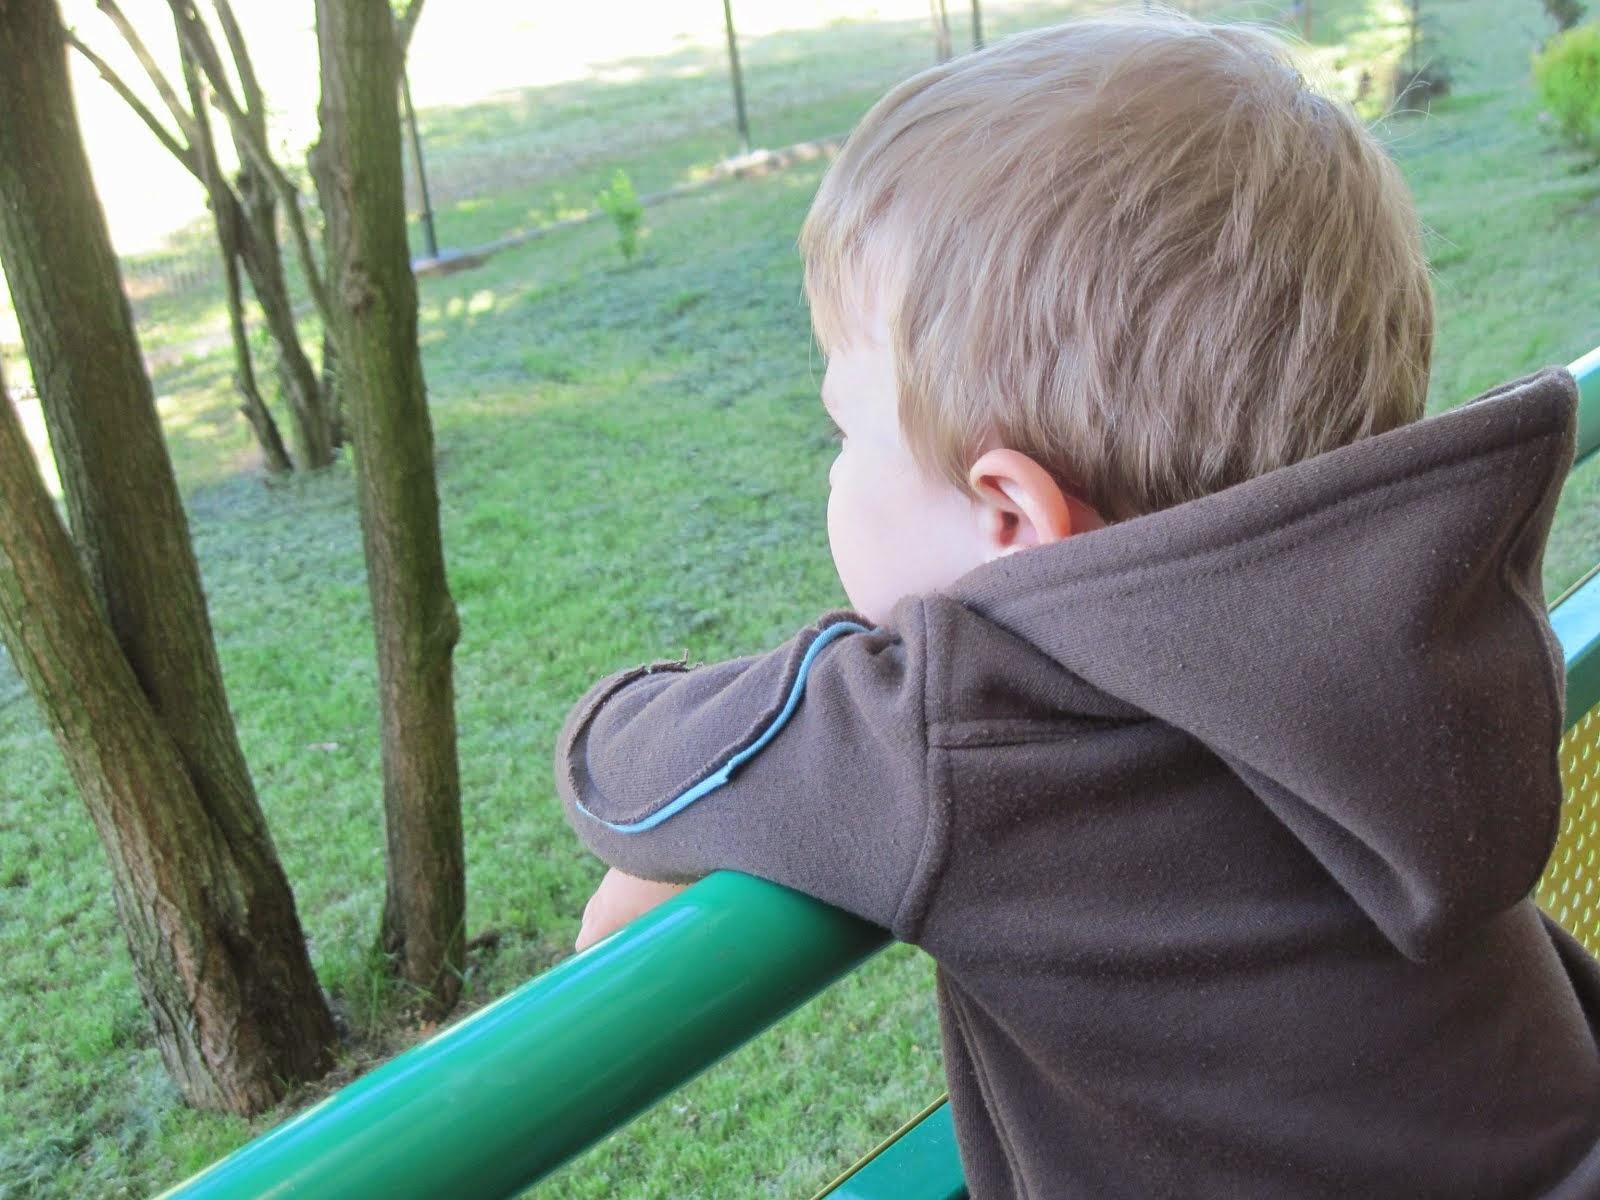 Ogólnopolskie Forum Montessori